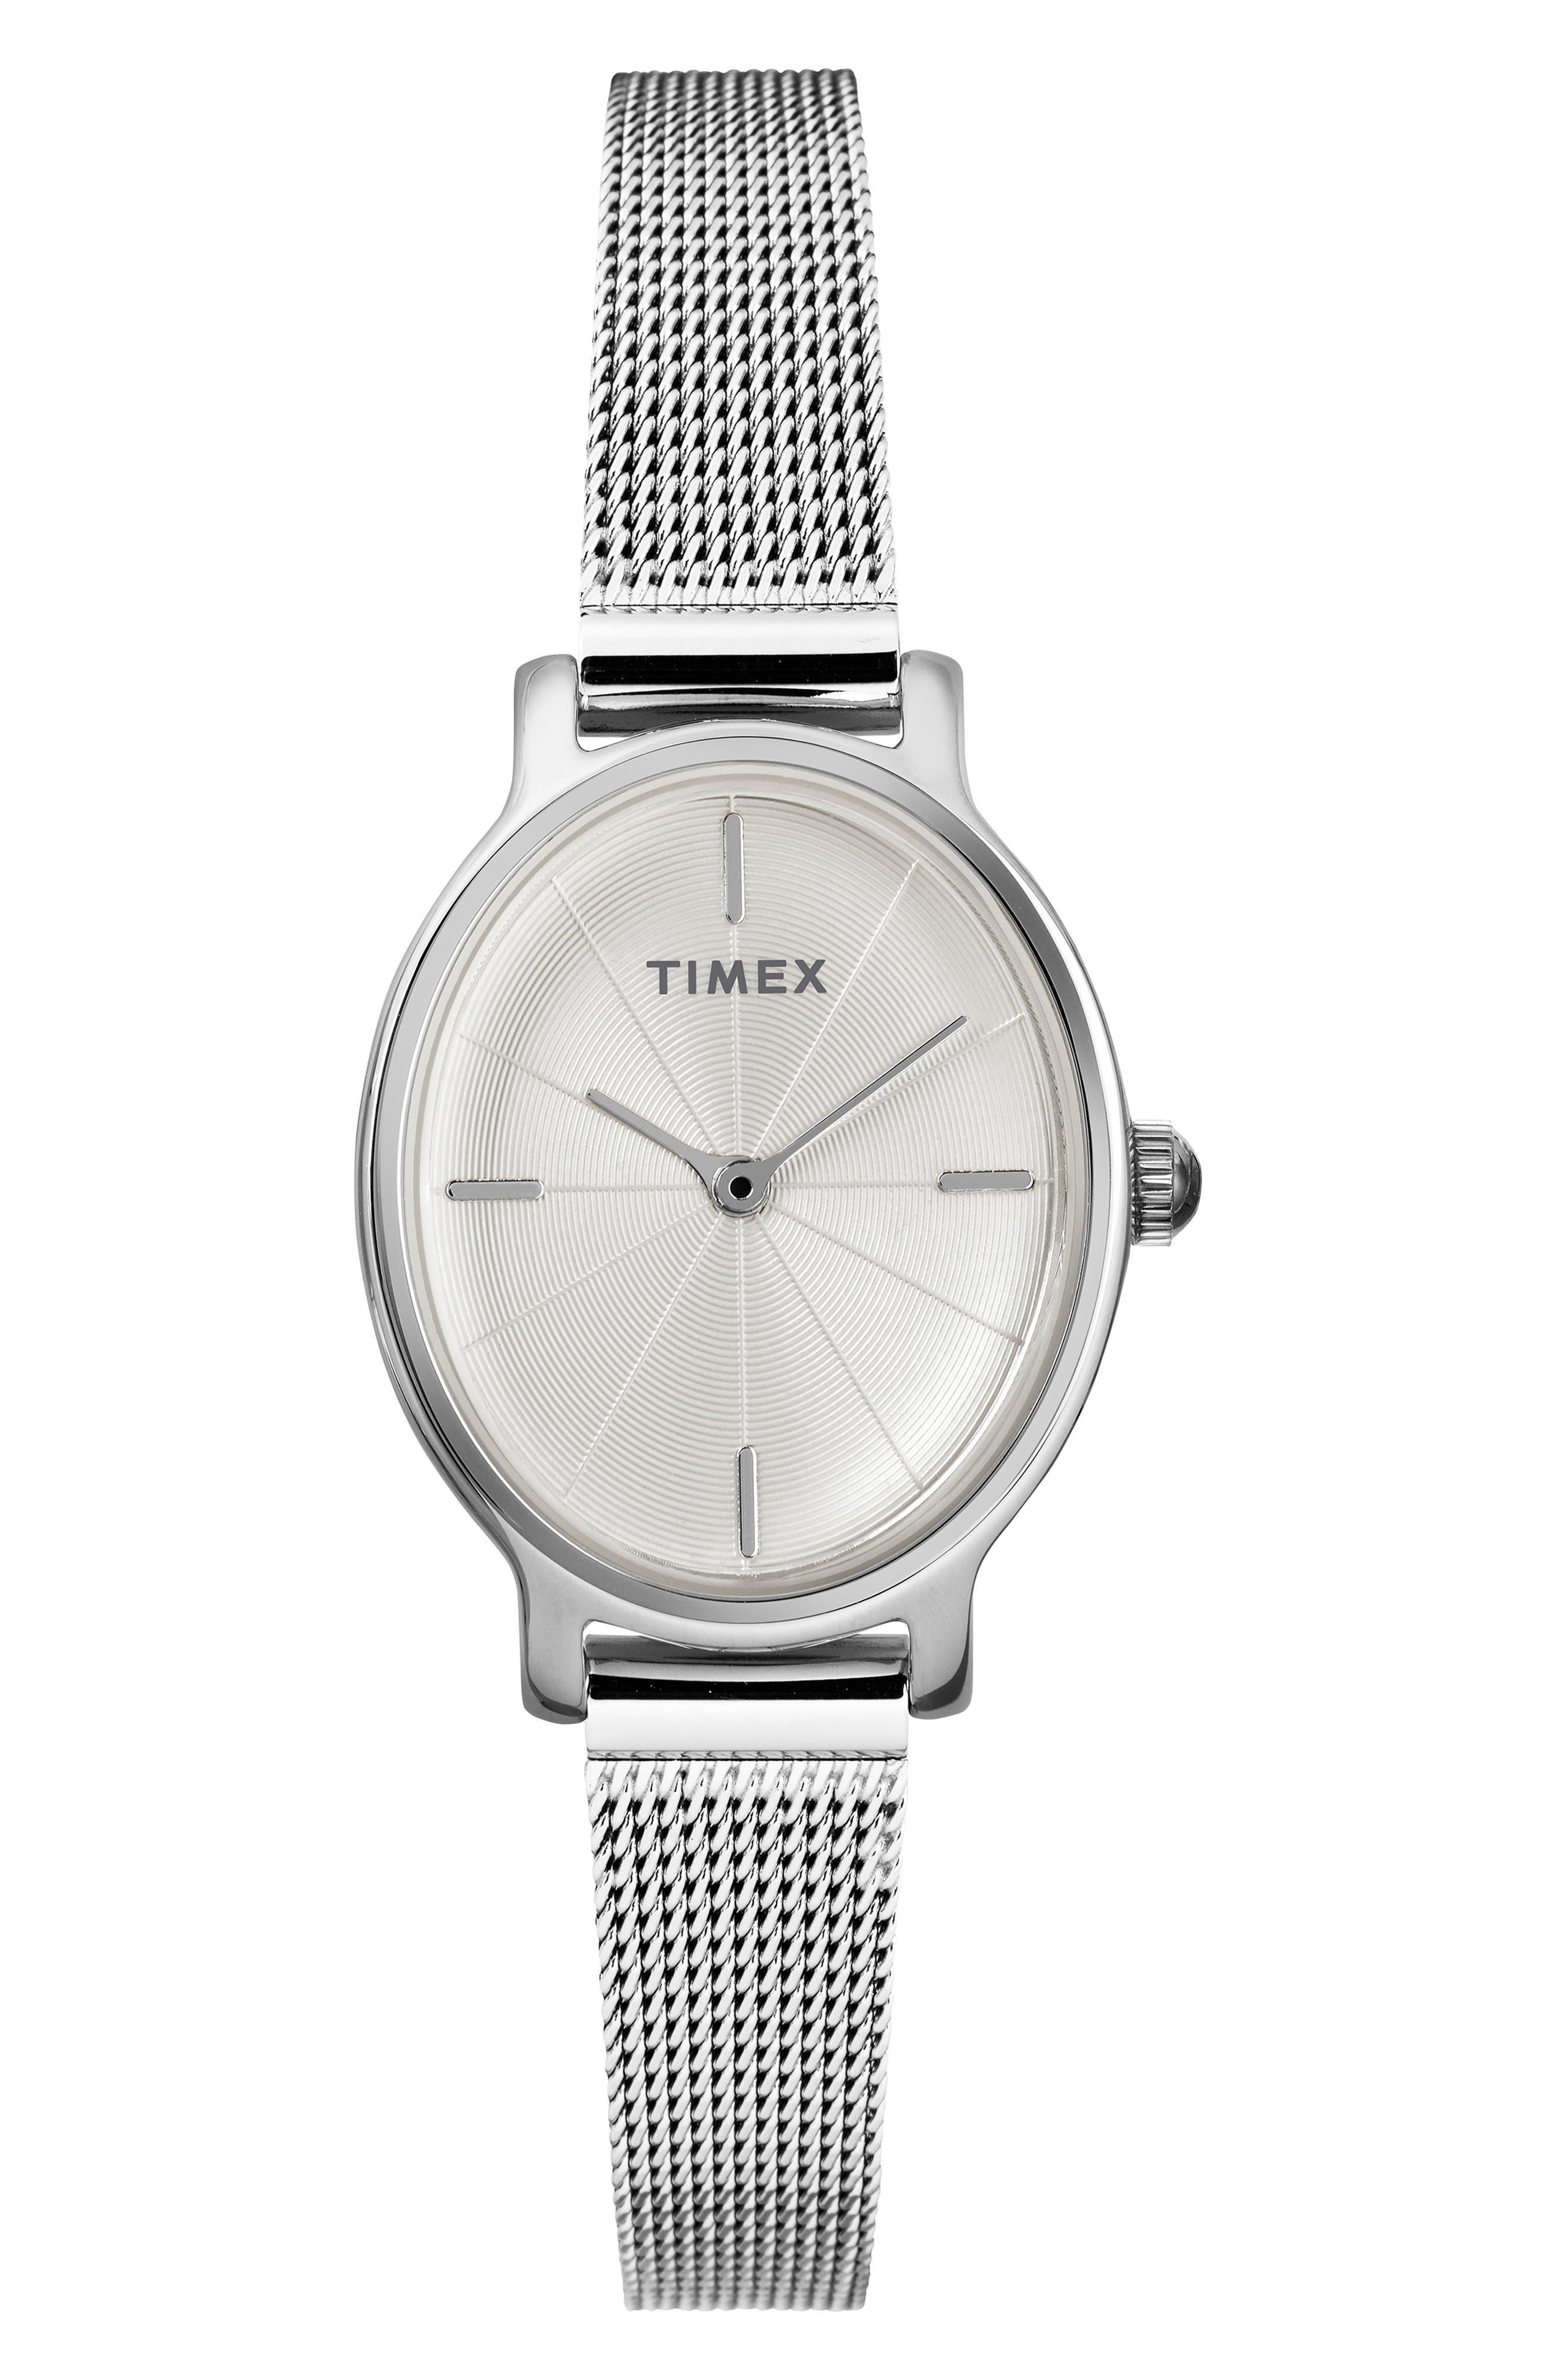 Timex Milano Oval Mesh Strap Watch, 2m